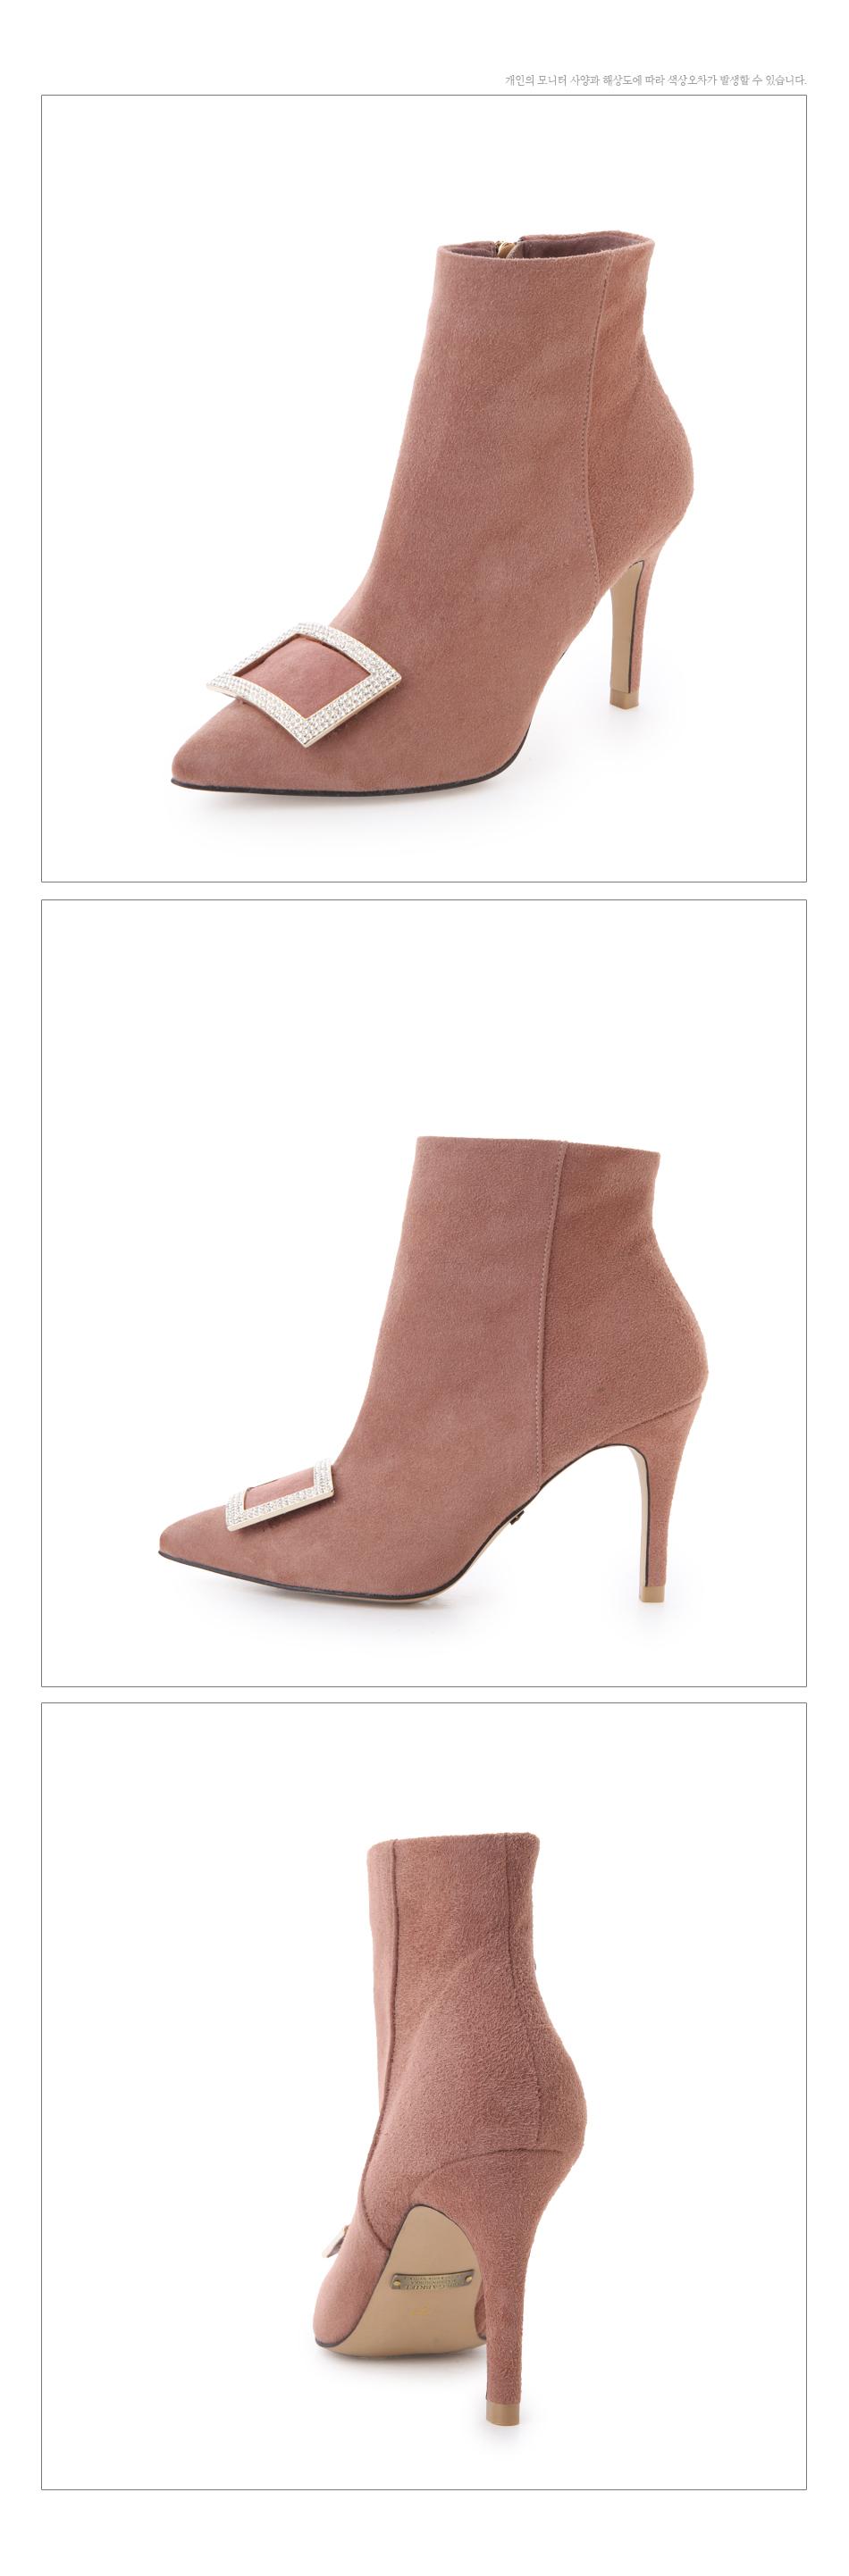 Boots Nữ Thiết Kế  6/7/8/9/10cm - GB961